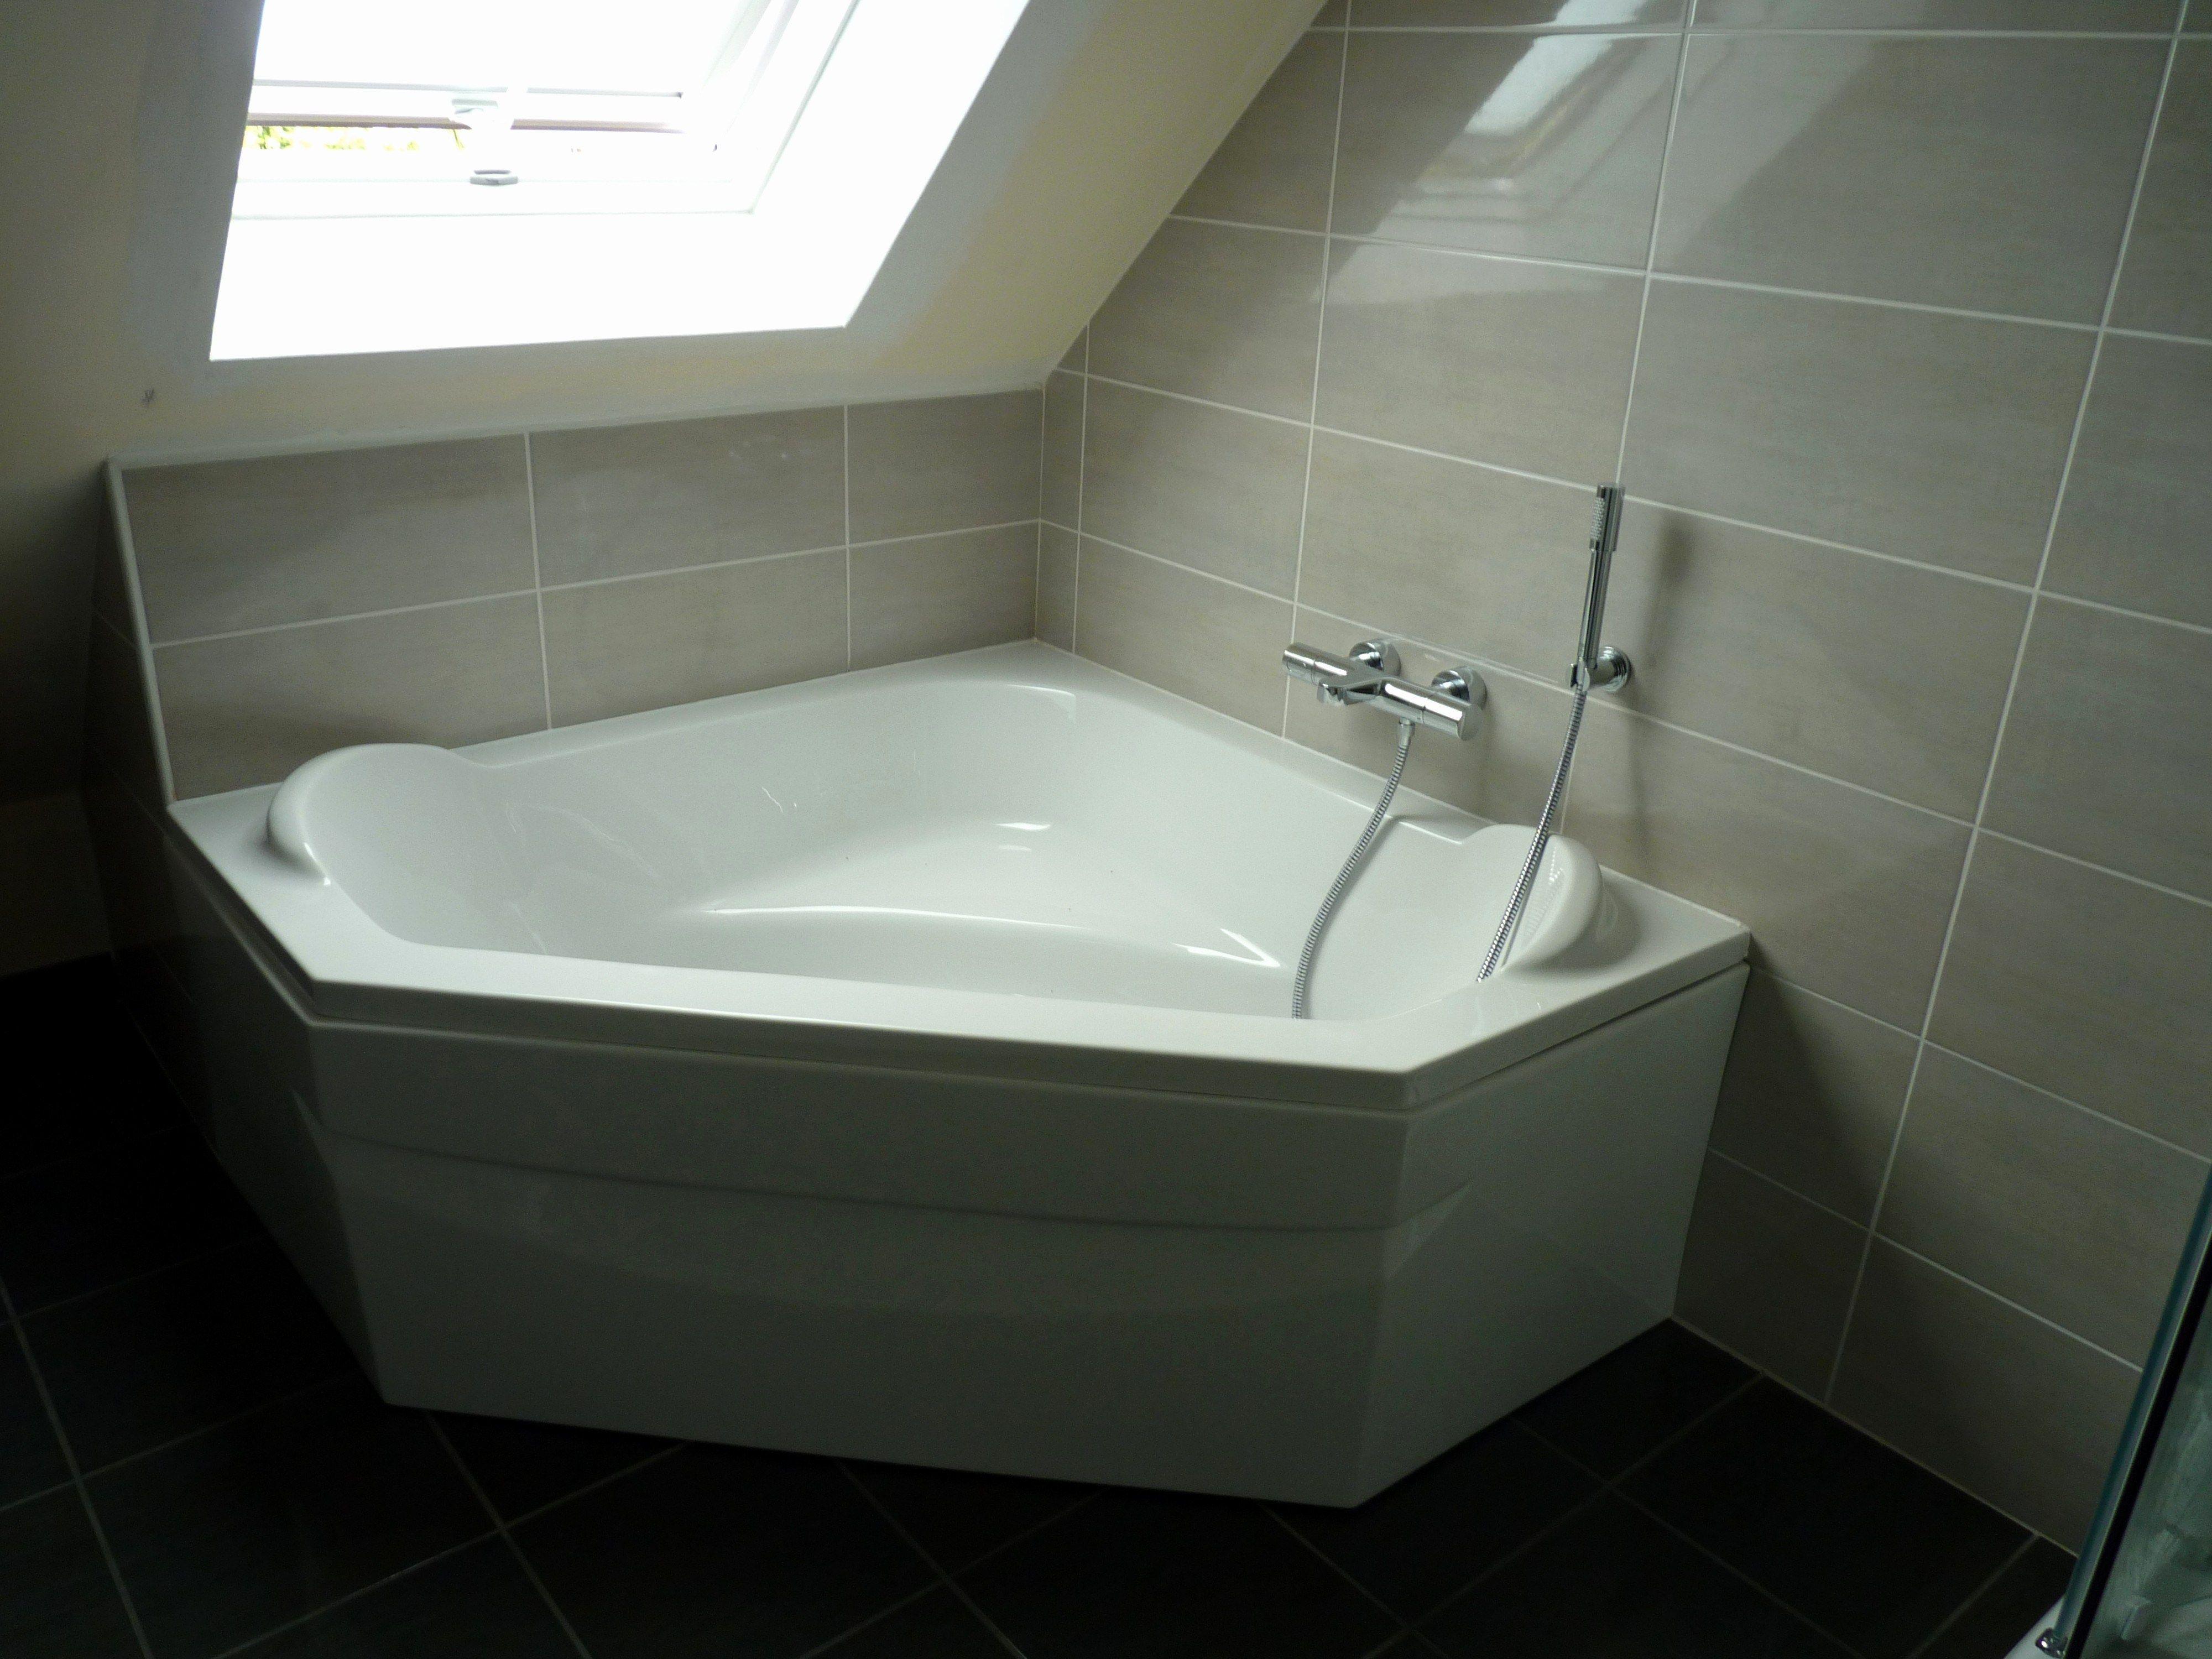 Baignoire D Angle 115x115 Baignoire D Angle 115x115 Castorama Baignoire Angle Pensez A Image Plus Est En Fai Small Bathroom Creative Bathroom Design Bathtub